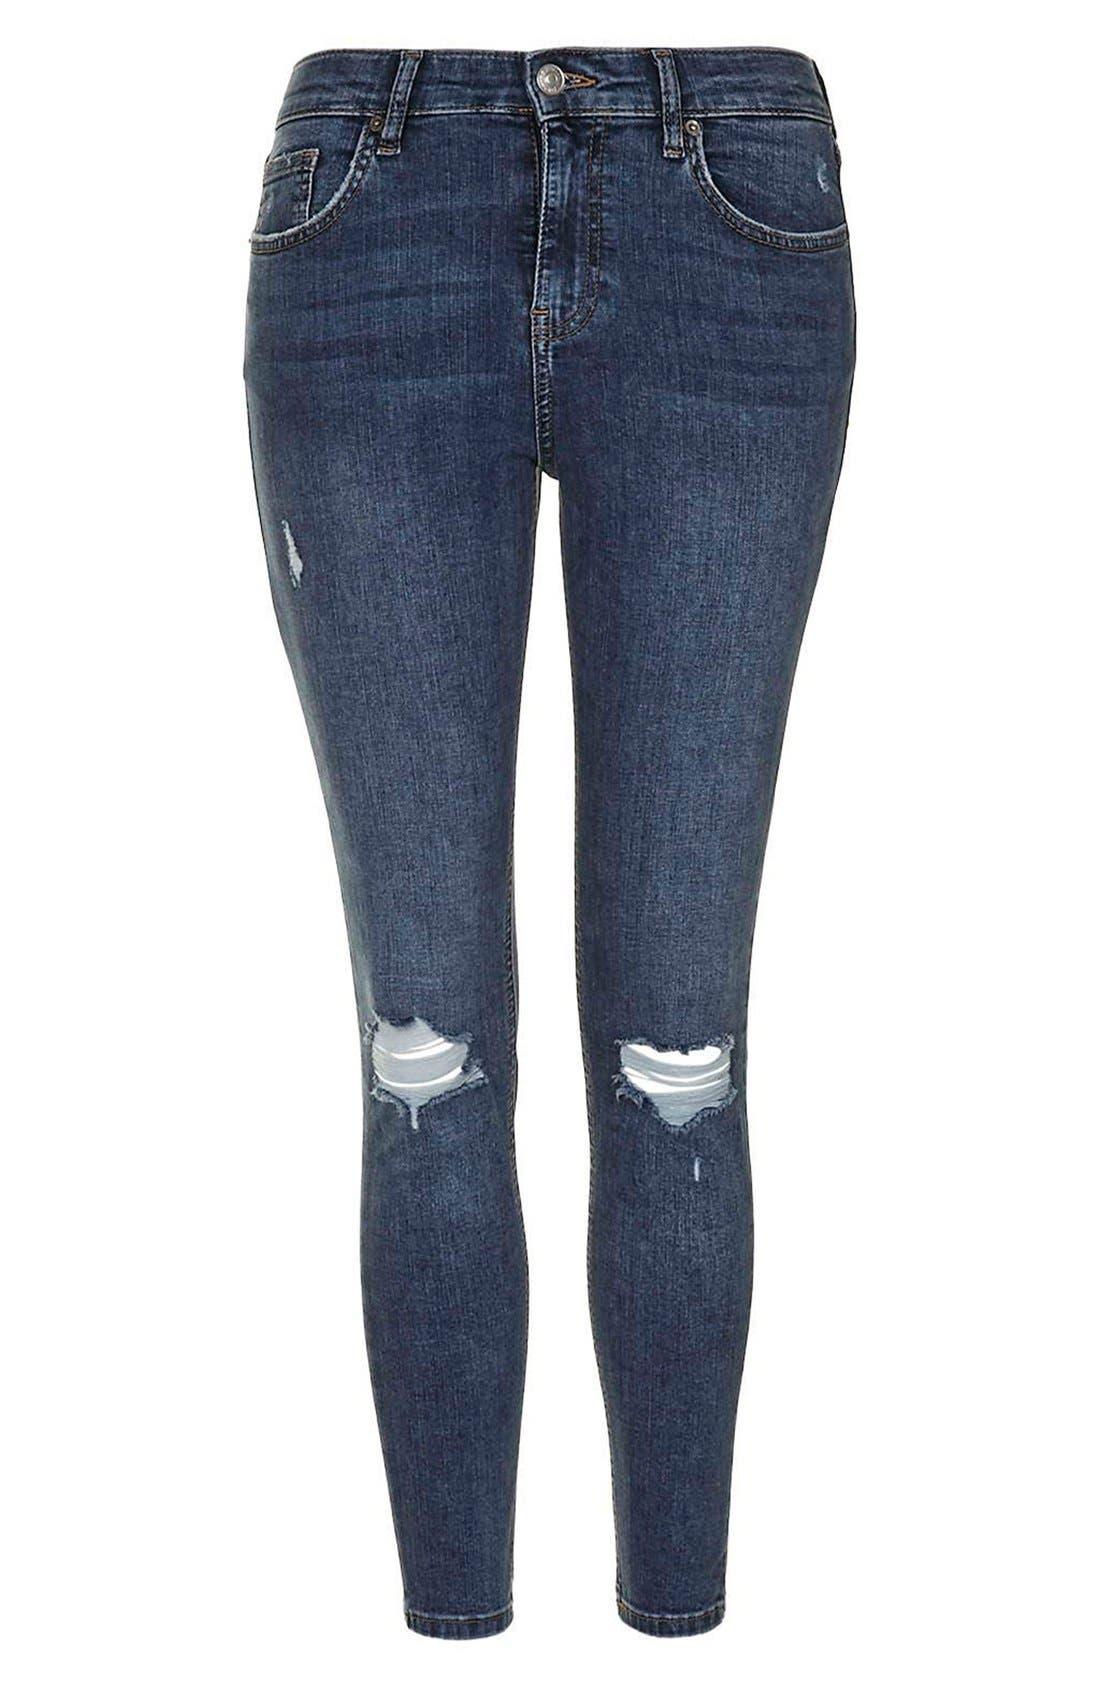 Alternate Image 4  - Topshop Moto 'Jamie' Ripped Skinny Ankle Jeans (Petite)